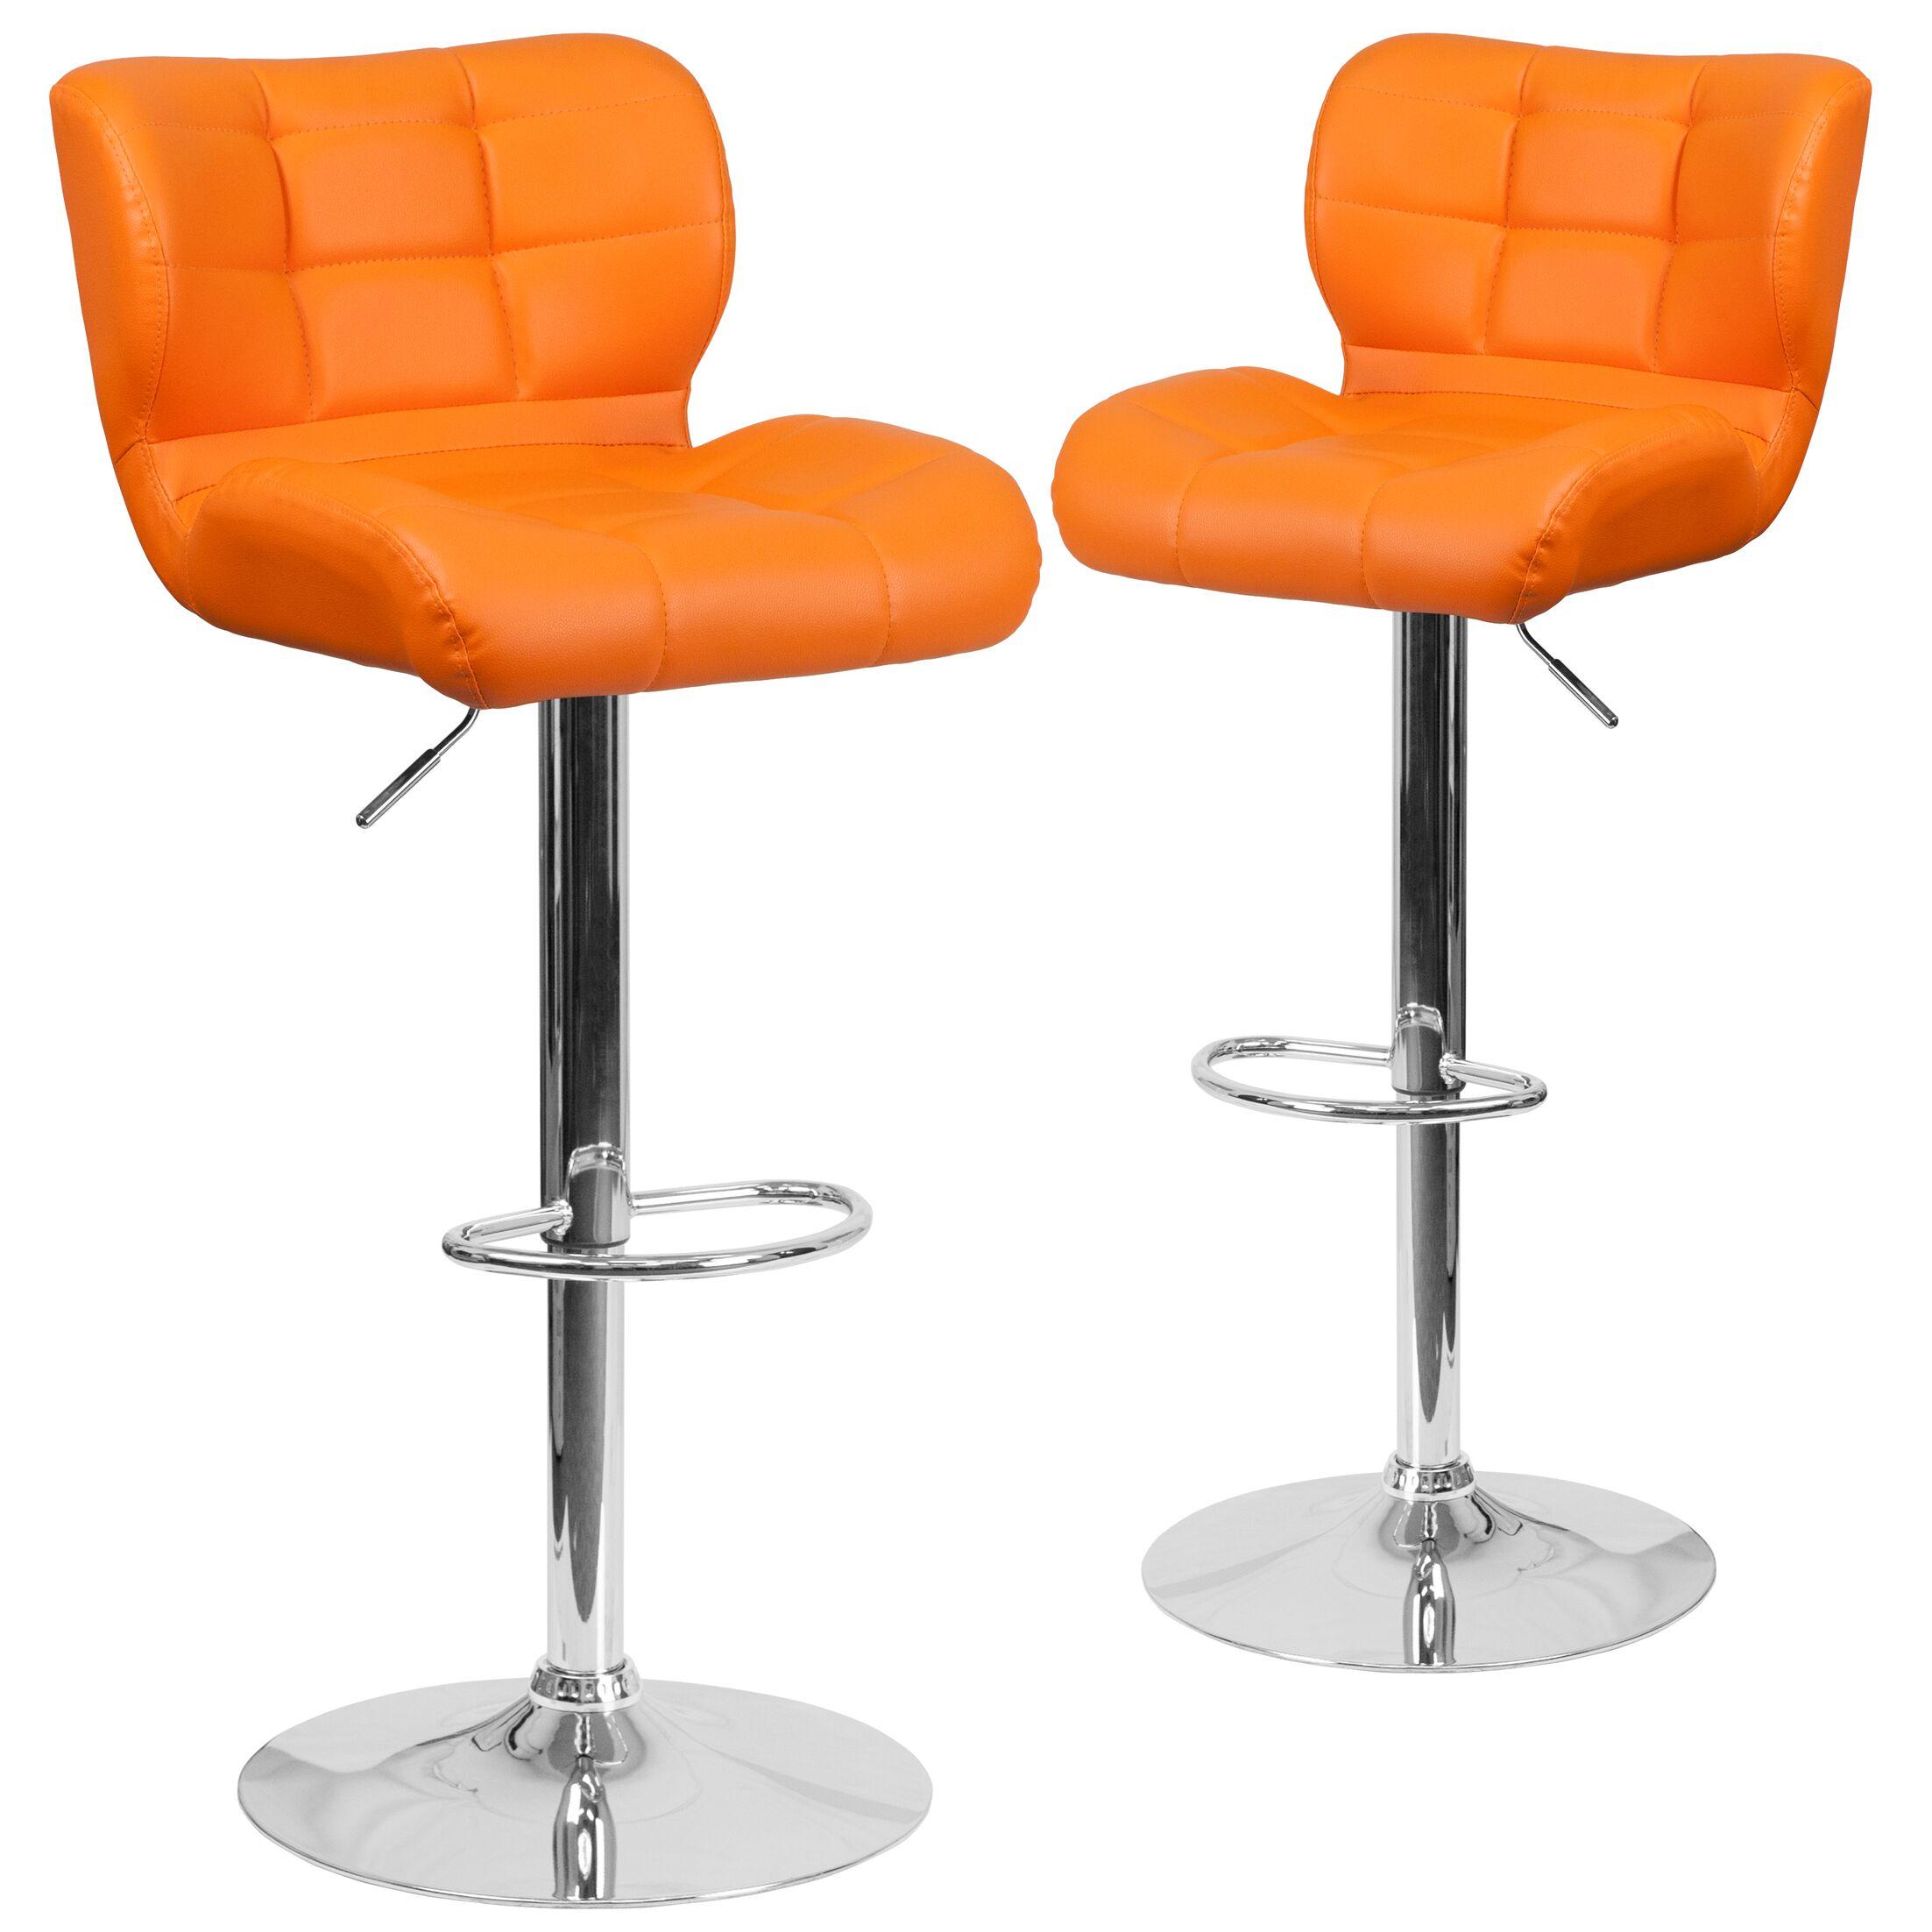 North Widcombe Adjustable Height Swivel Bar Stool Upholstery: Orange